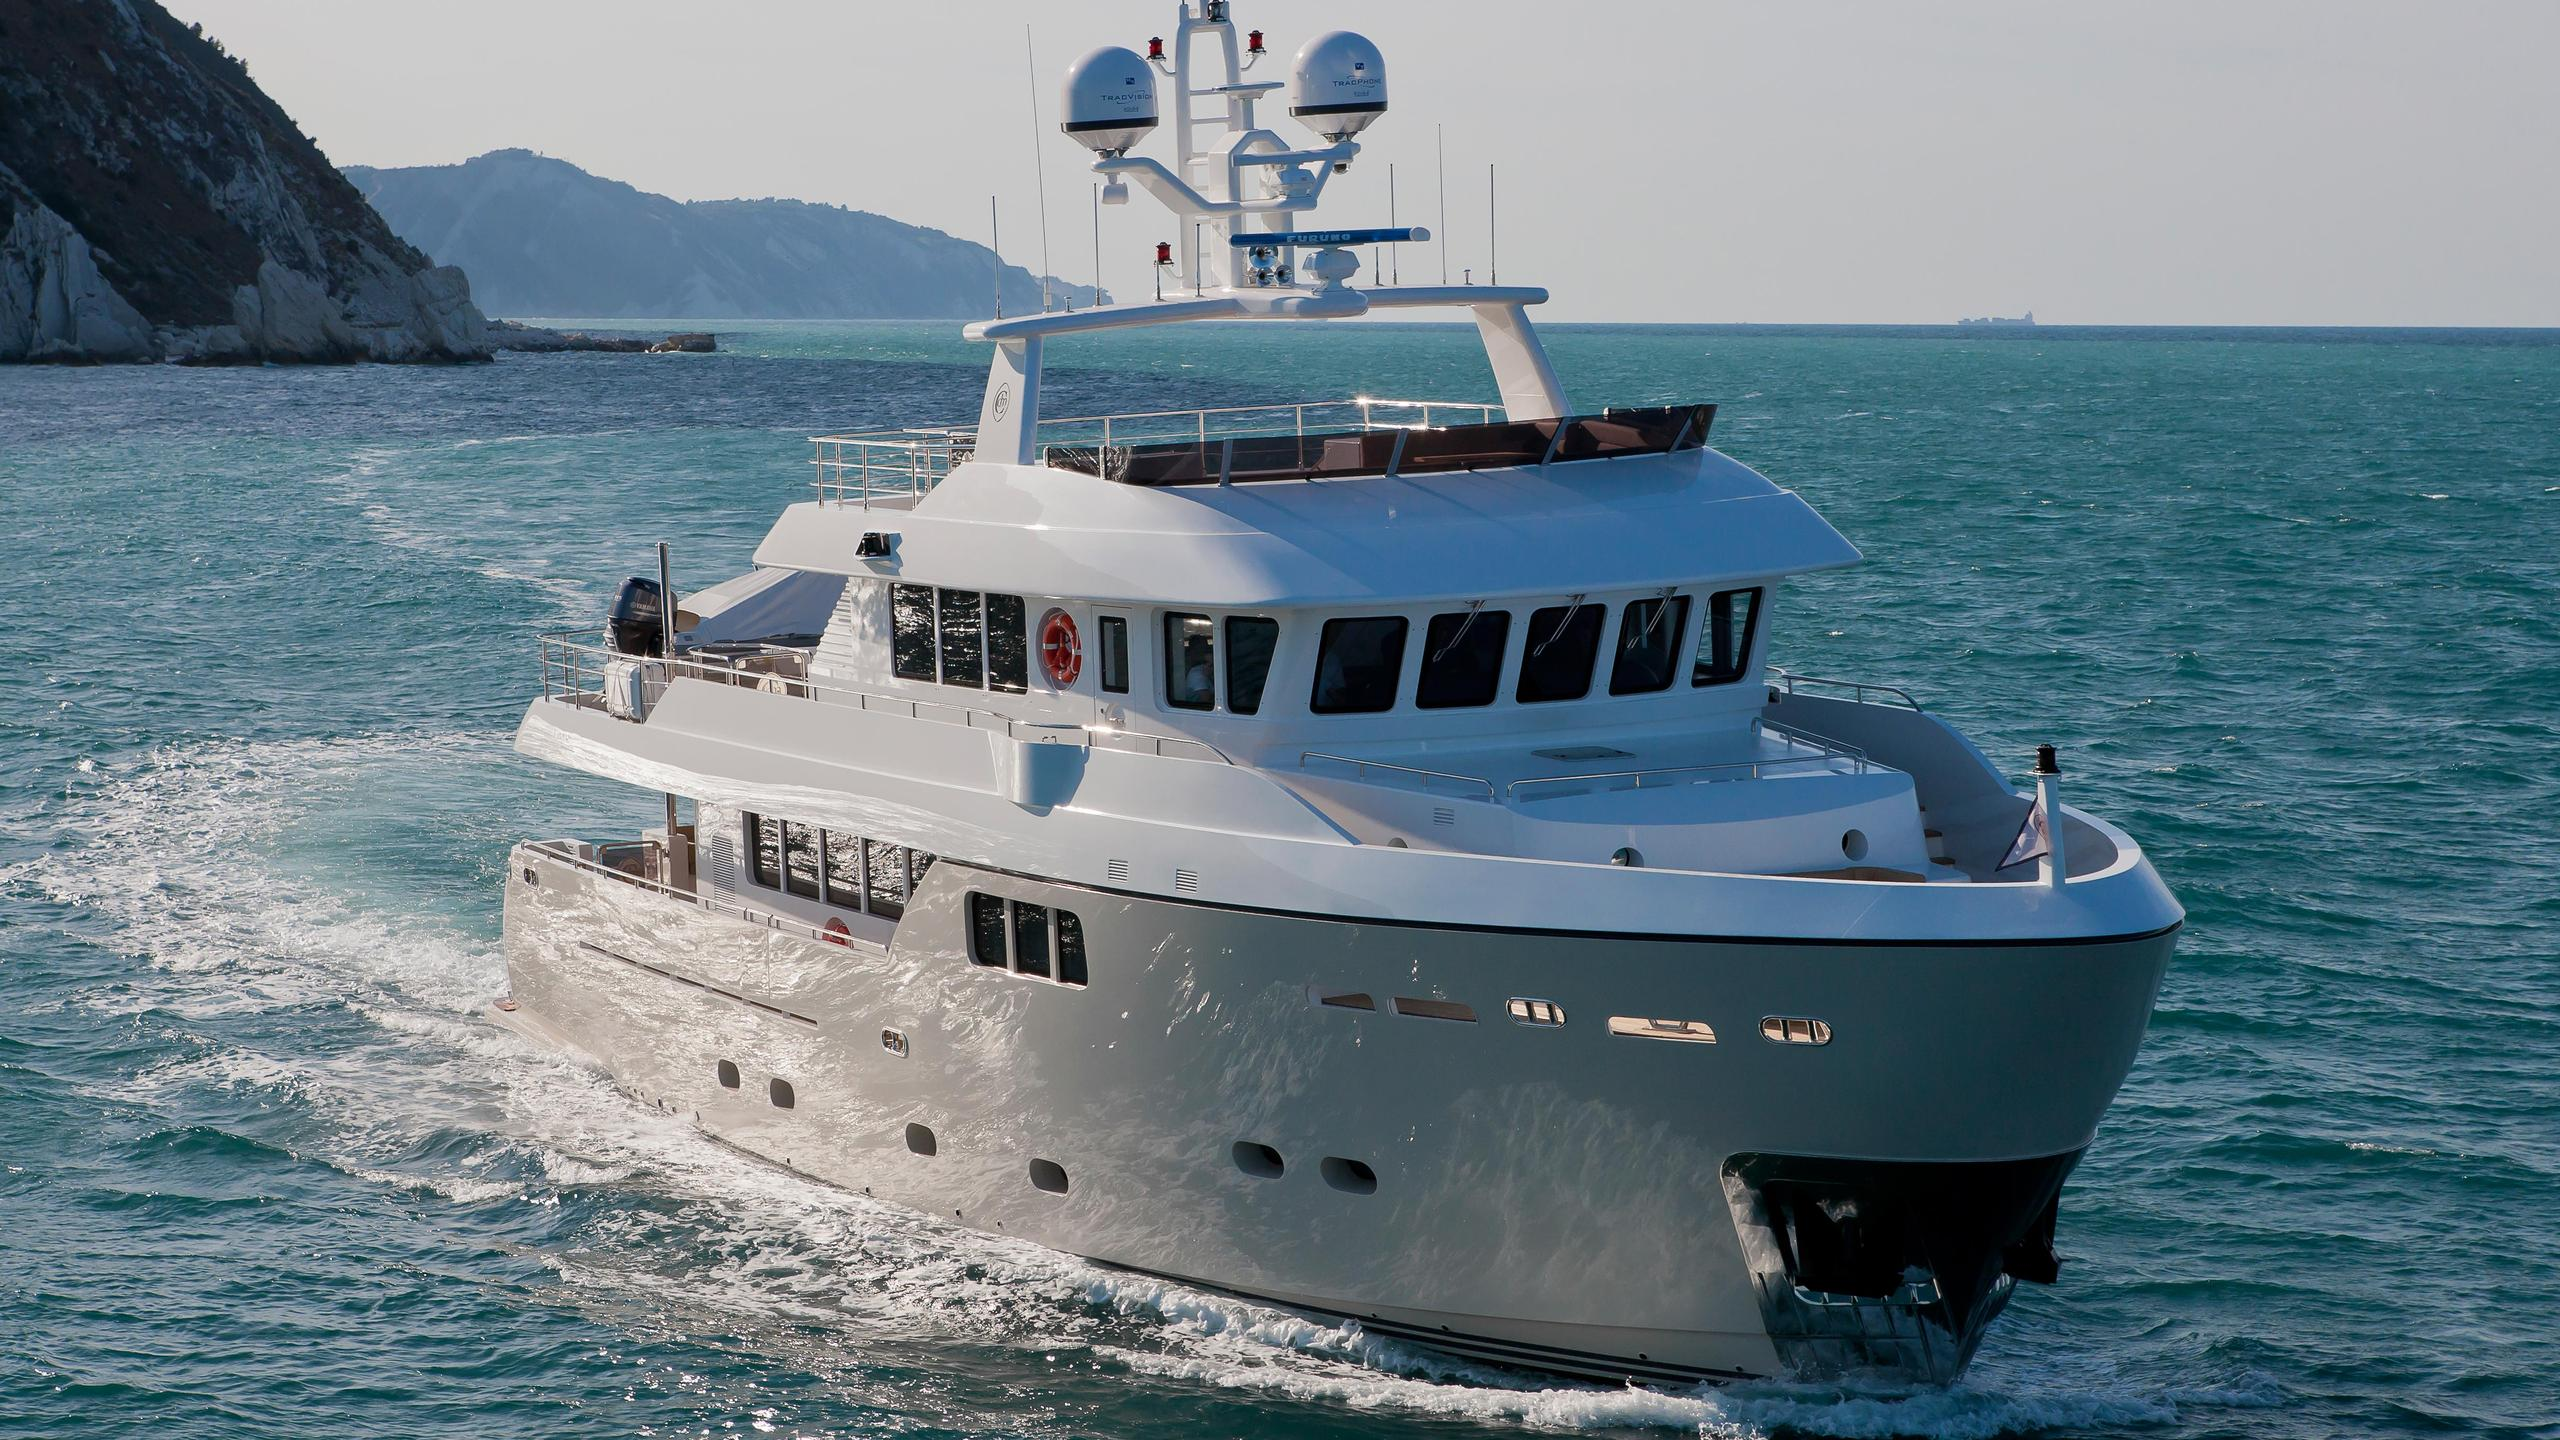 percheron-motor-yacht-cantiere-delle-marche-darwin-86-2012-26m-bow-cruising